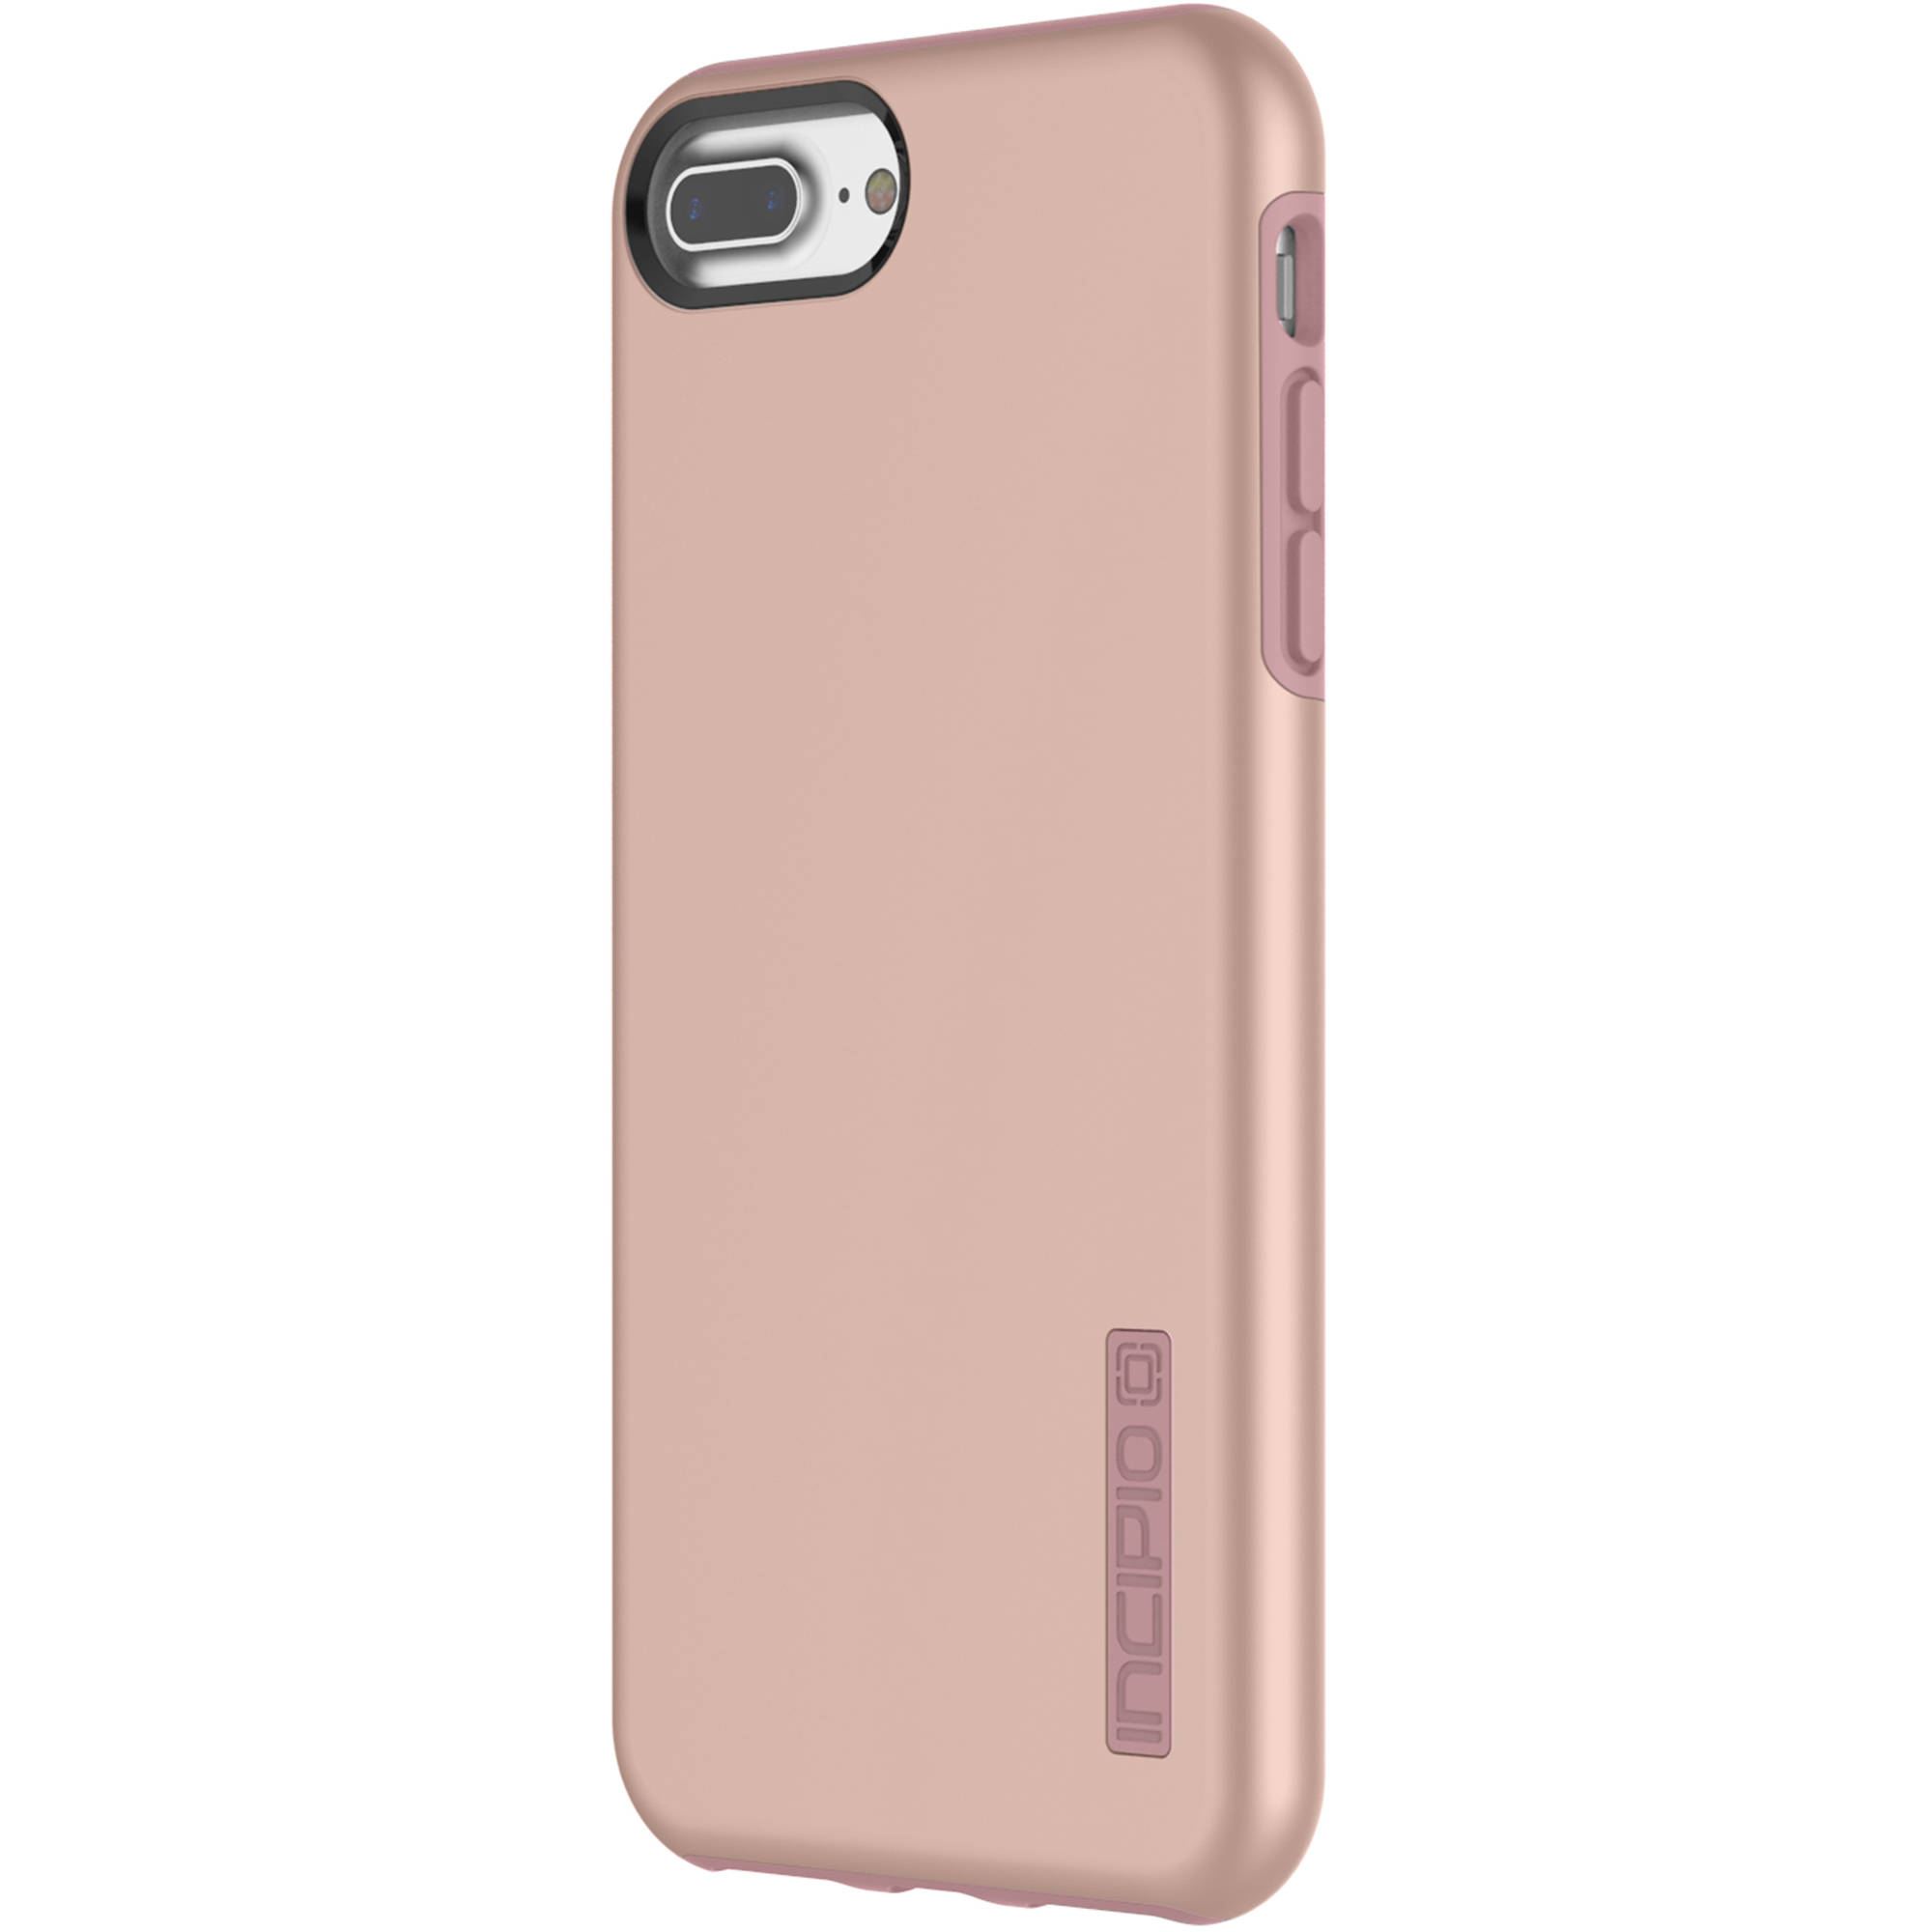 official photos 6cf7e 1b315 Incipio DualPro Case for iPhone 7 Plus/8 Plus IPH-1491-RGD B&H